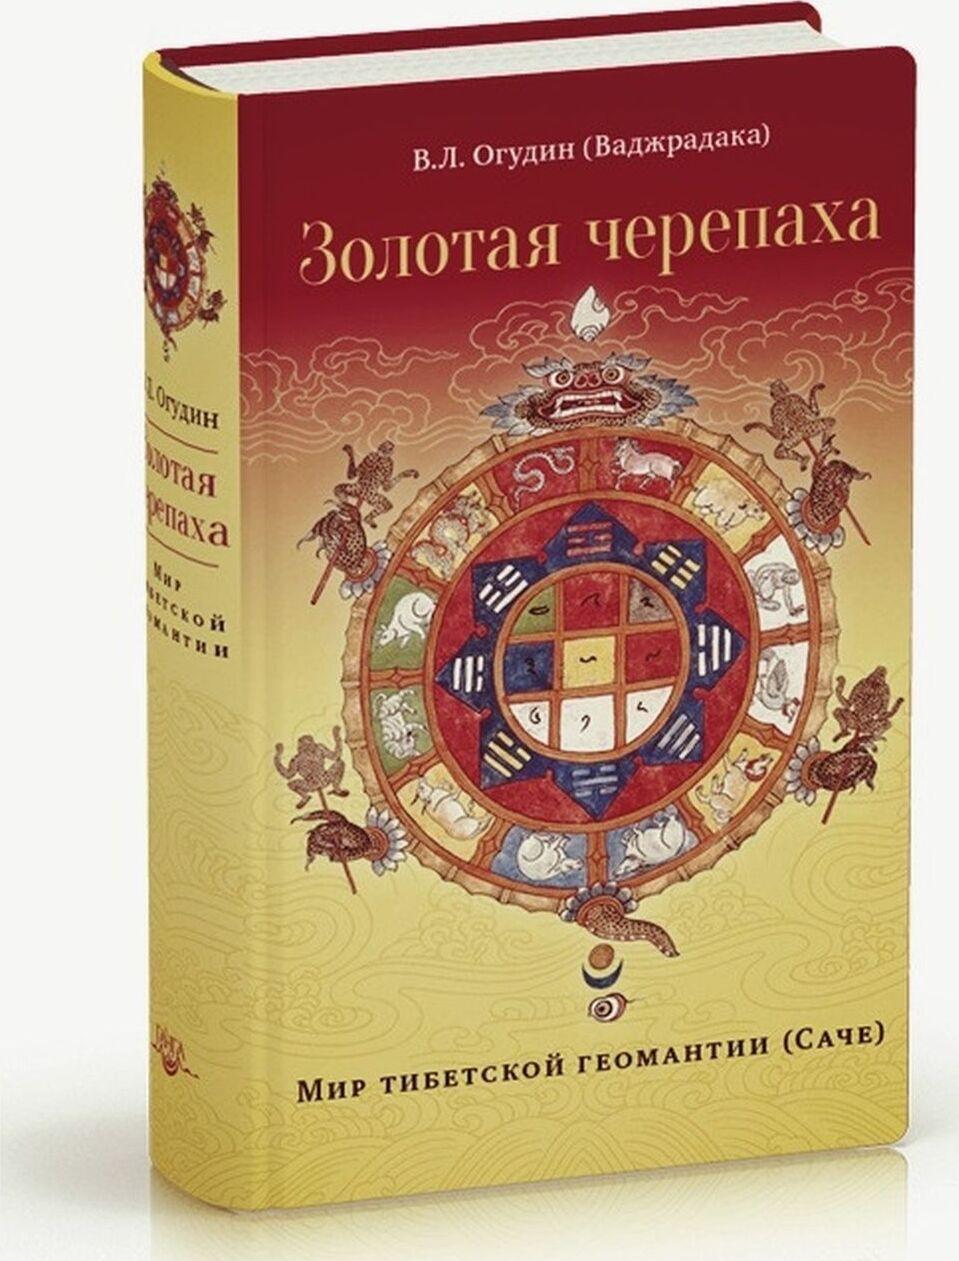 Zolotaja cherepakha. Mir tibetskoj geomantii (Sache)